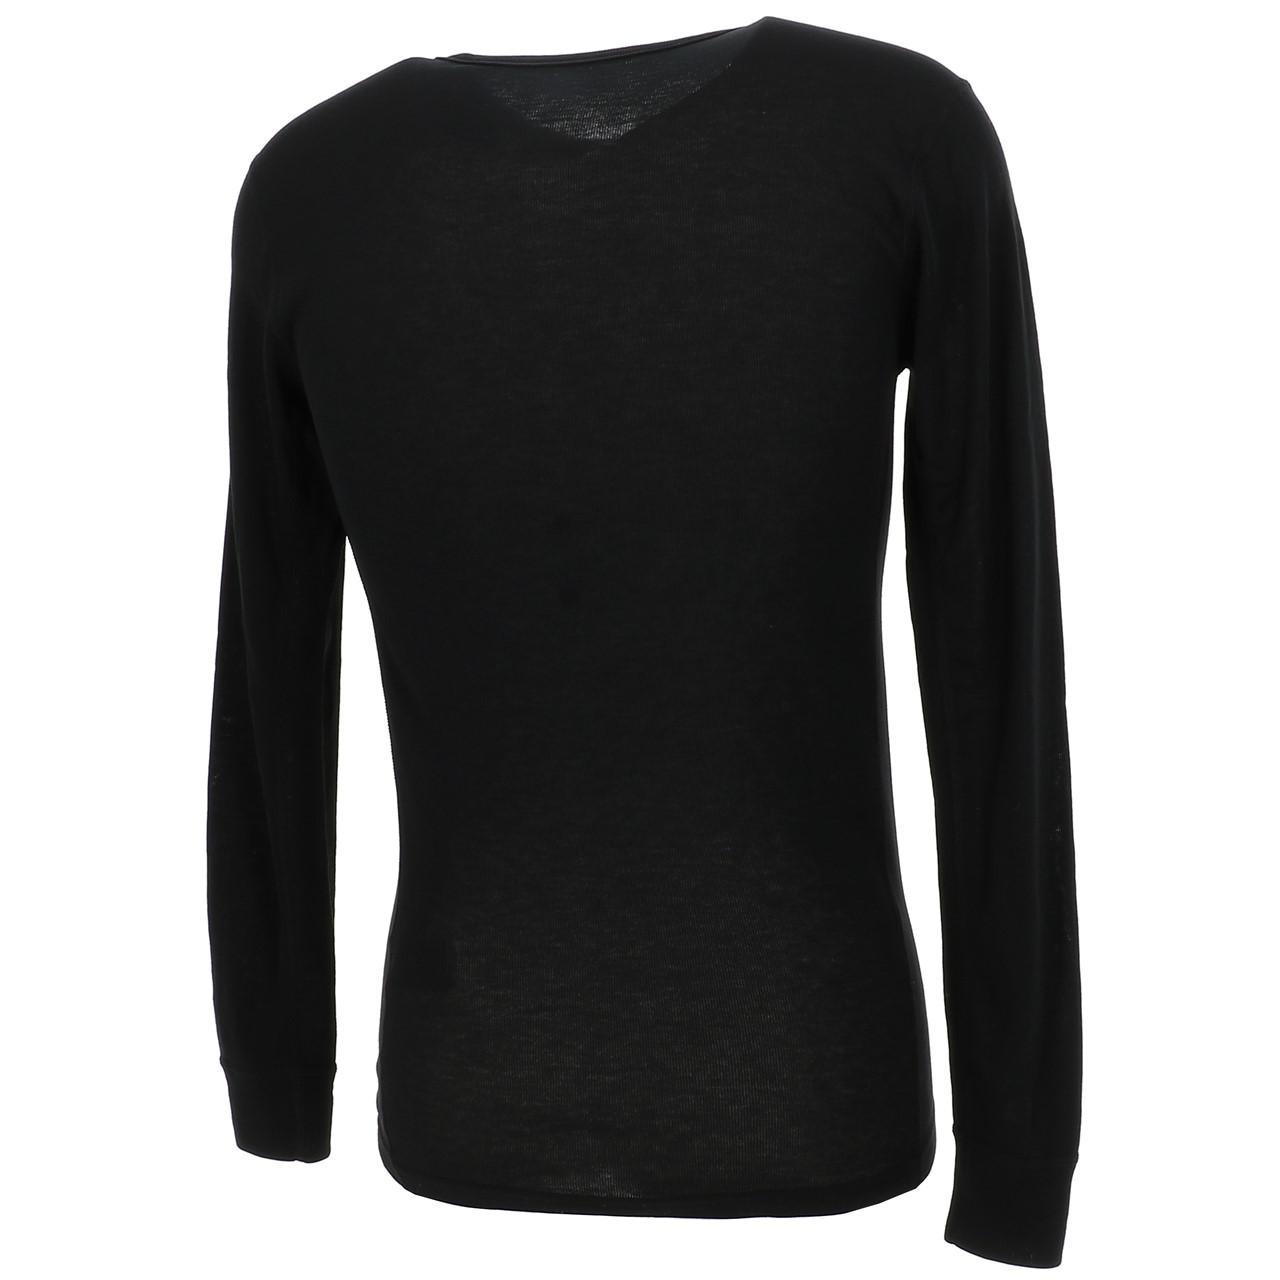 Under-Clothing-Thermal-Hot-Odlo-Warm-Black-DRC-ML-Tee-Black-85353-New thumbnail 5